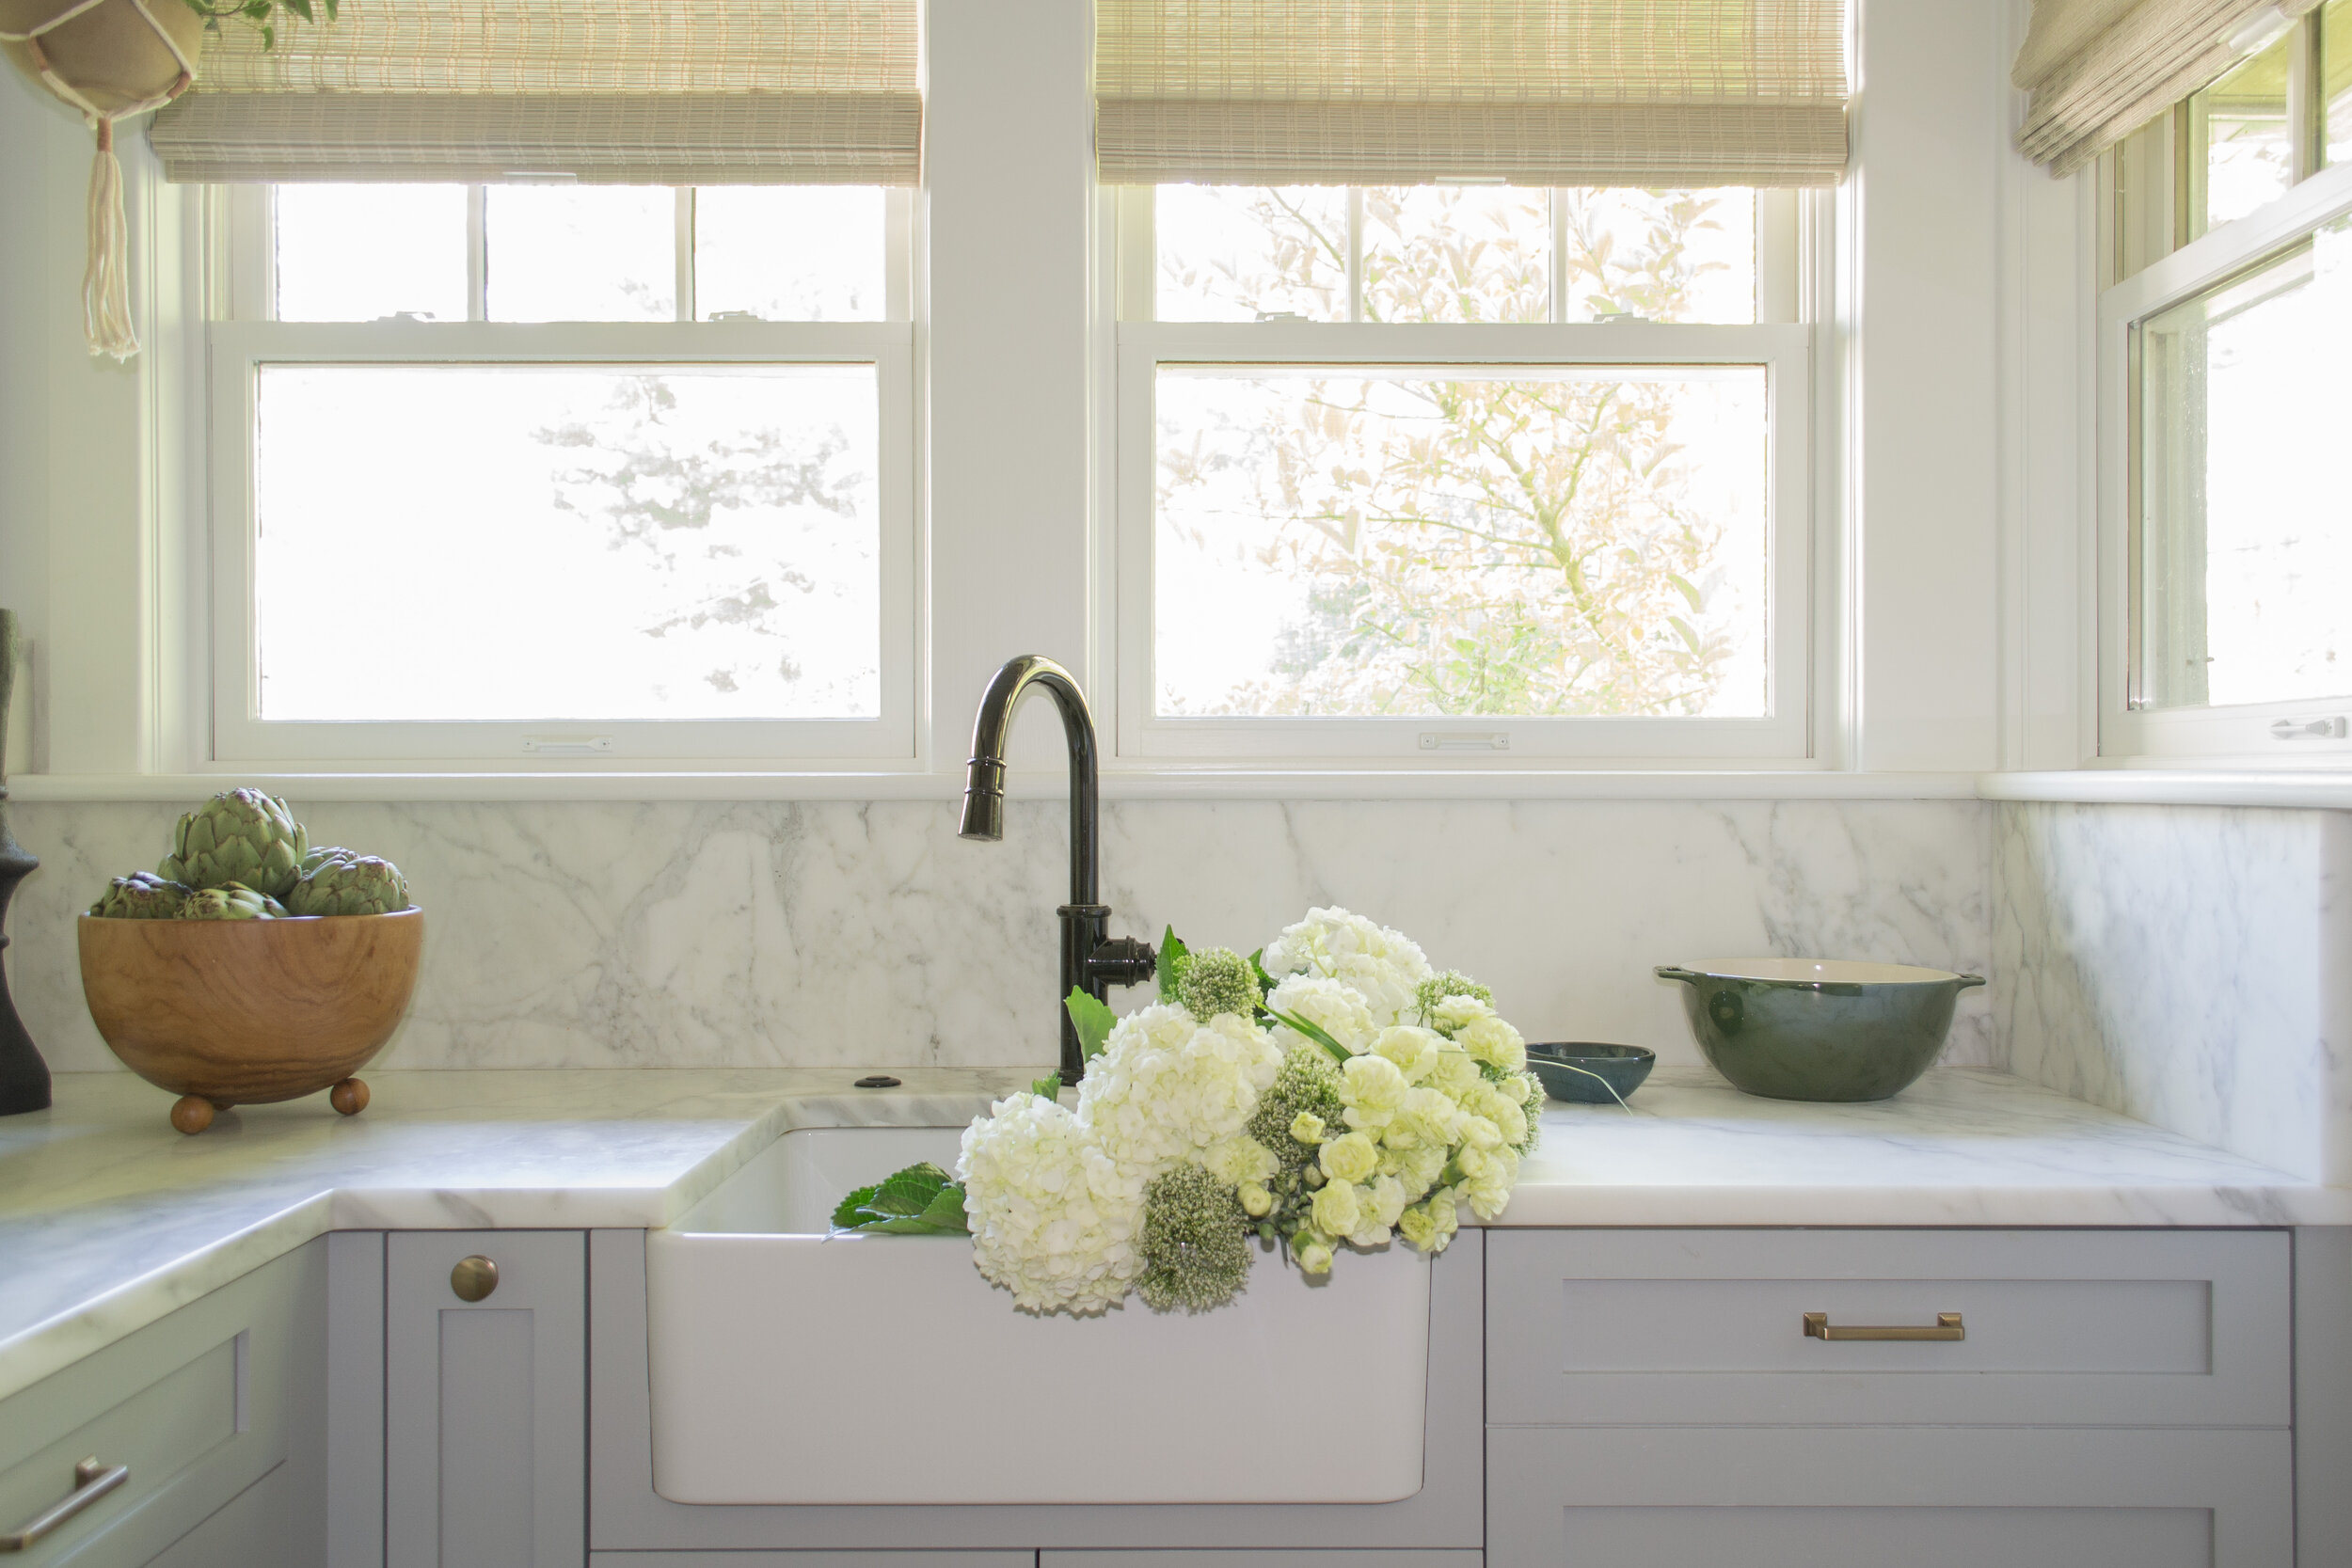 kitchen-gray-modern-tc-interiors-4.jpg